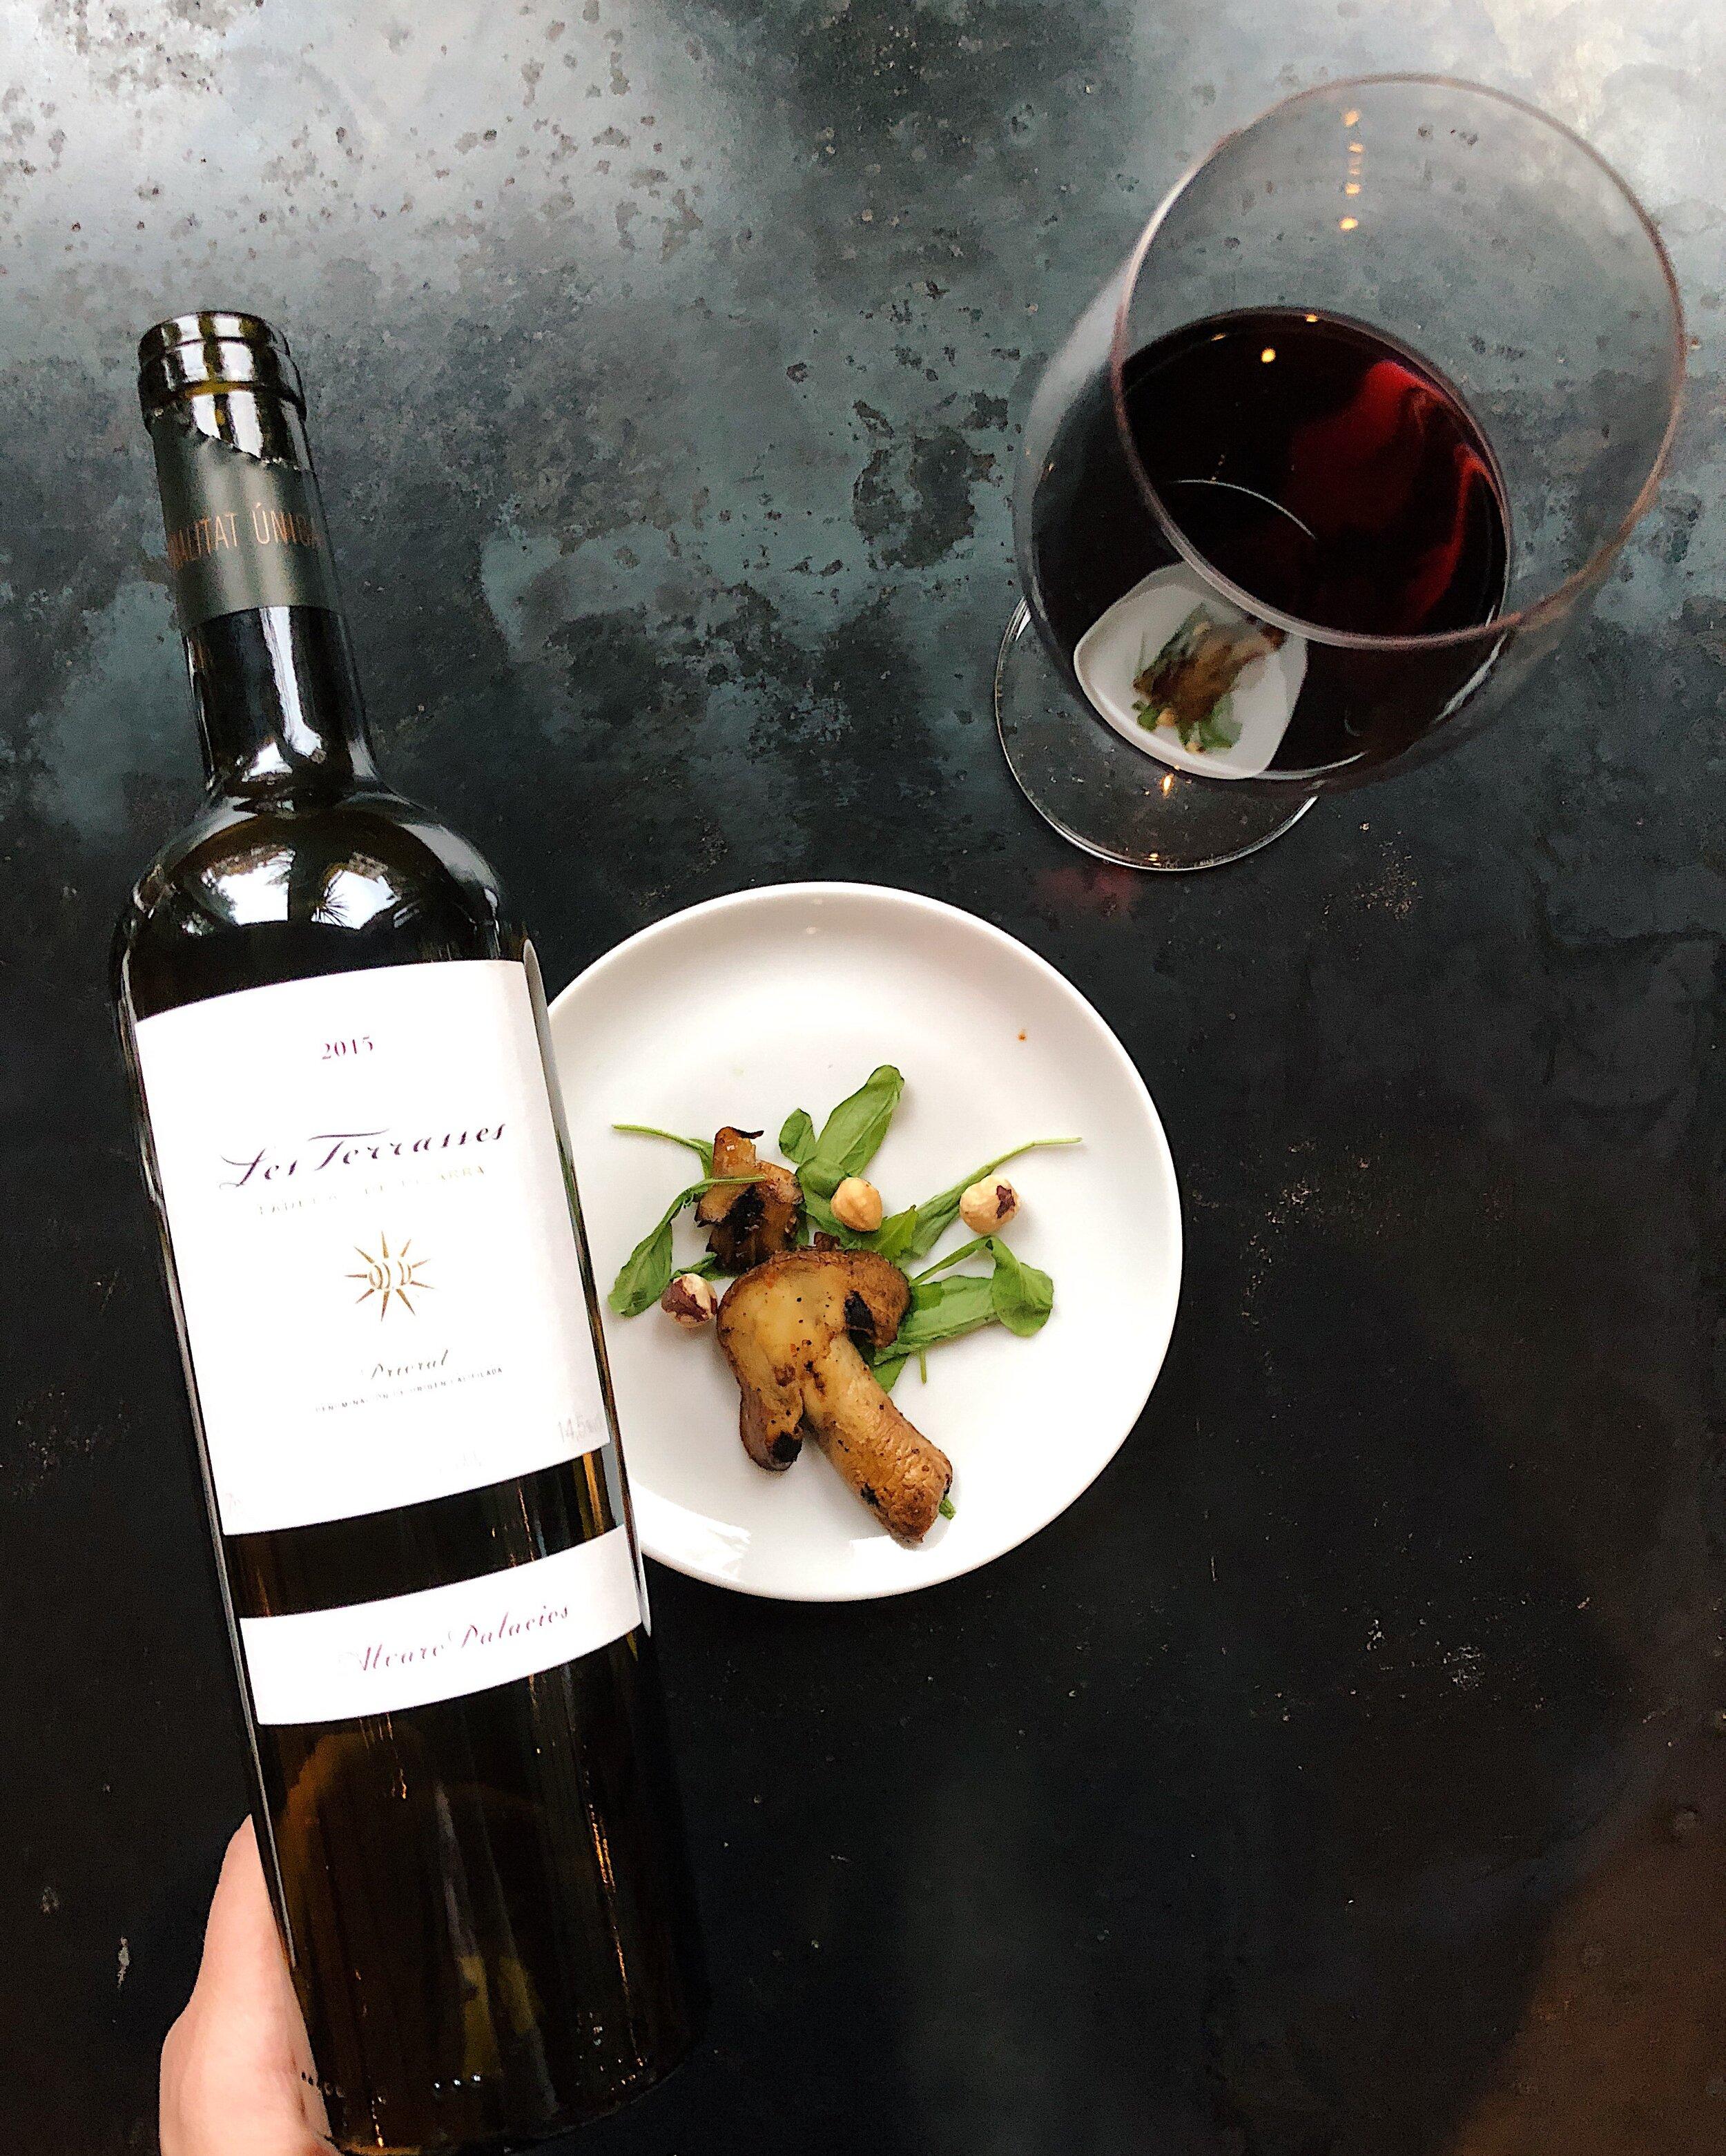 wine_wise_walk_red_portland_maine_spain.jpg